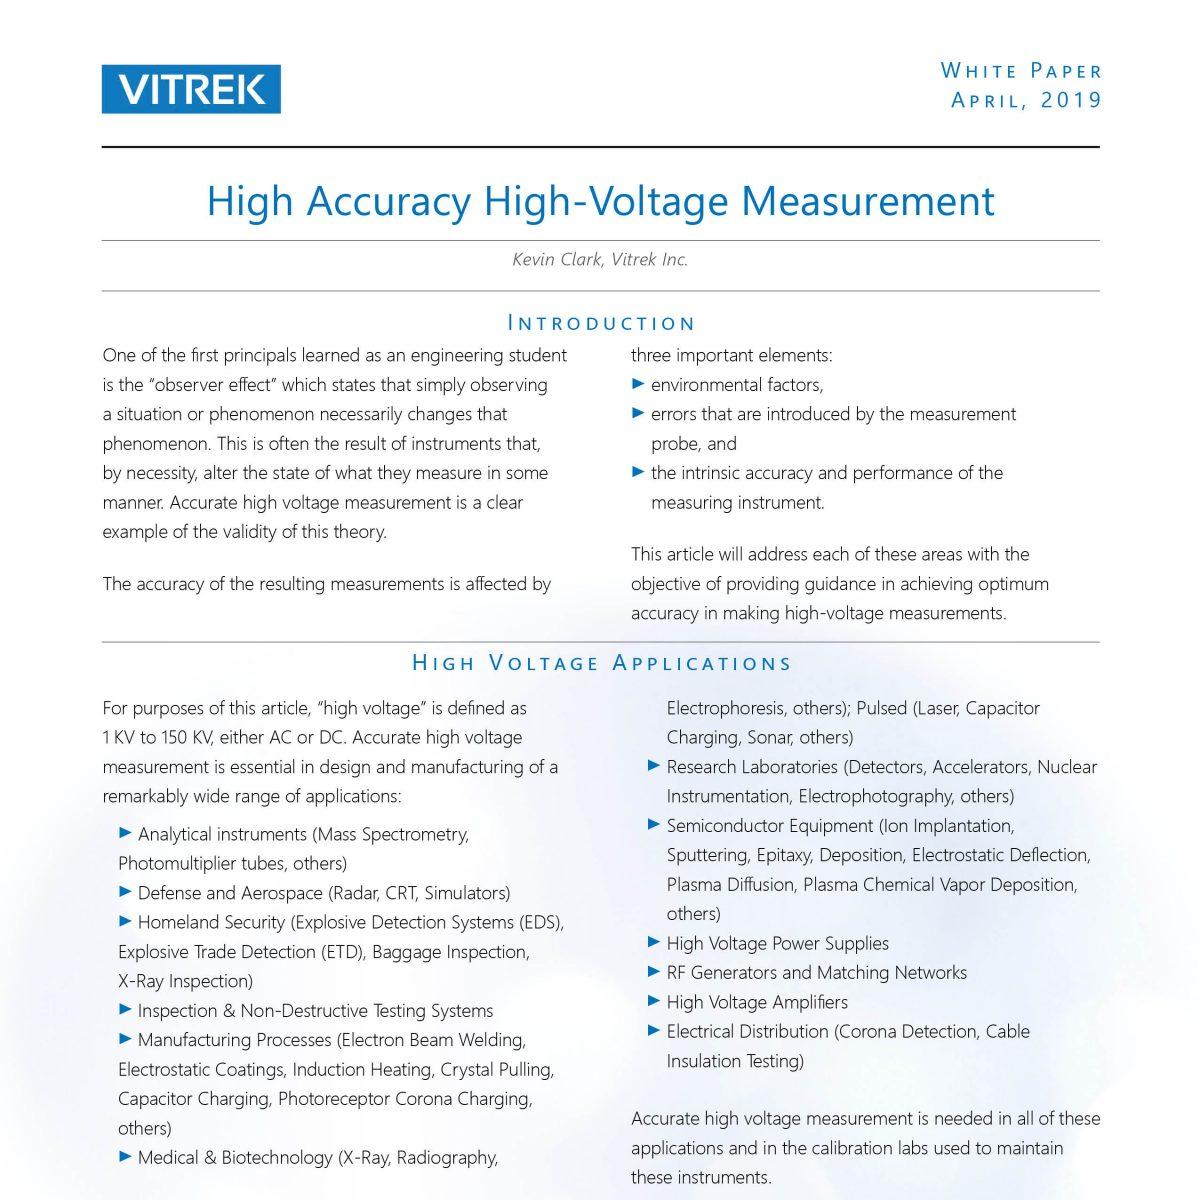 Vitrek_High Voltage Measurement WP front image